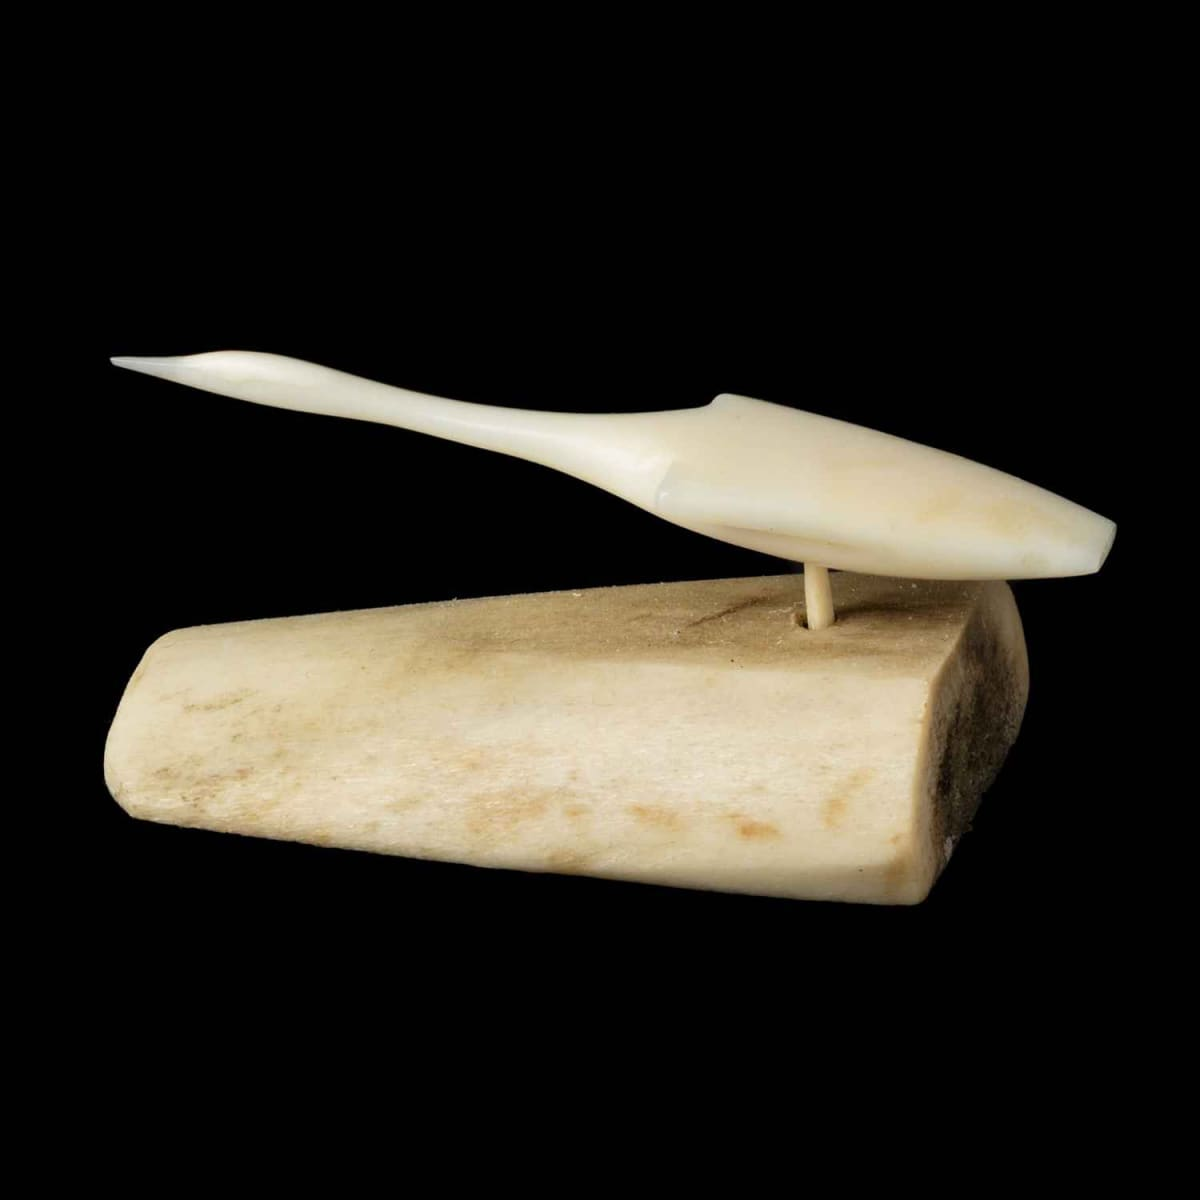 27. UNIDENTIFIED ARTIST, KUGAARUK (PELLY BAY) Flying Bird